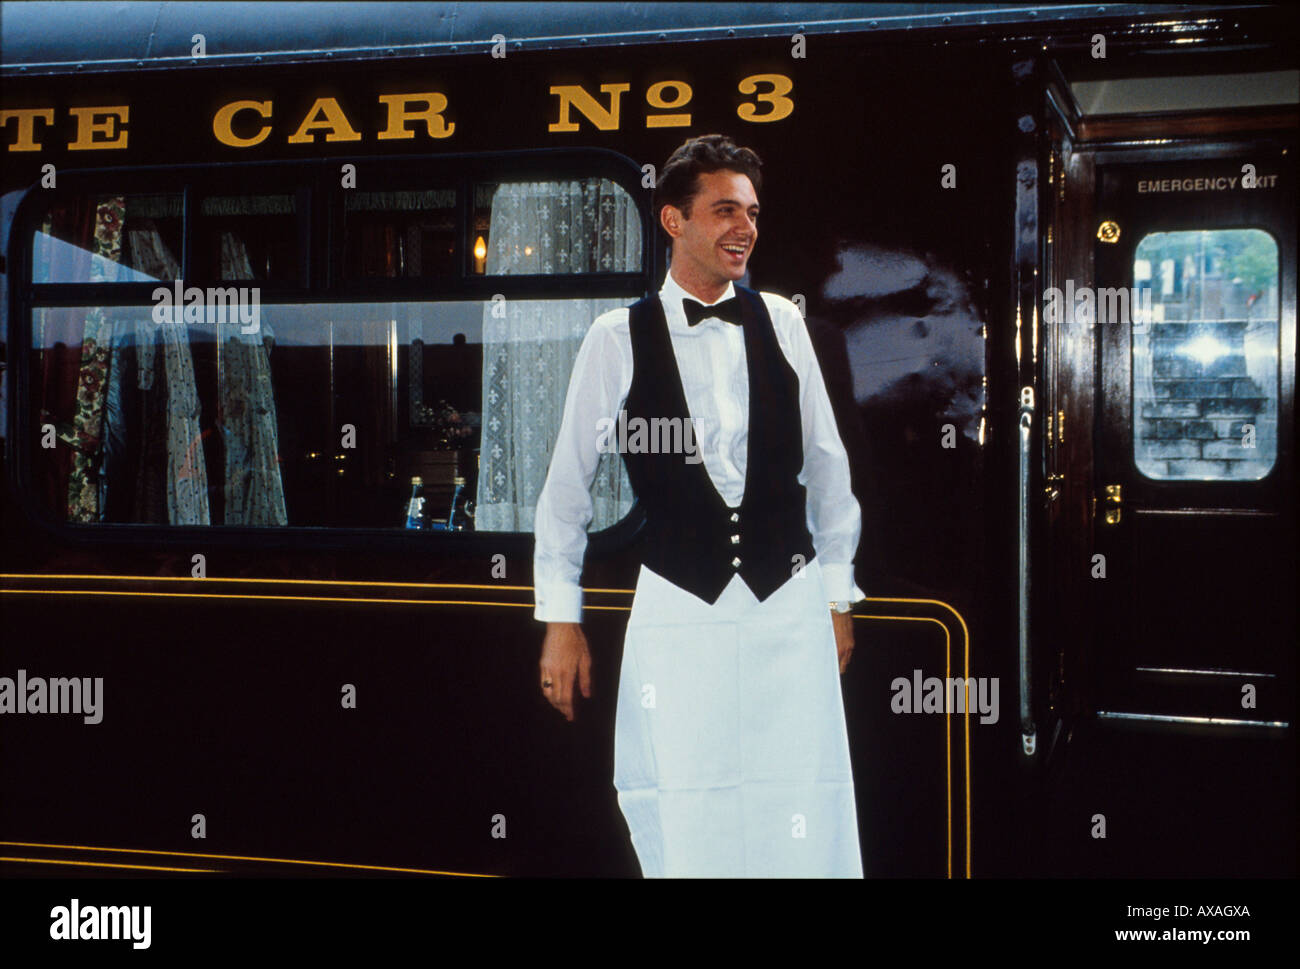 Waiter-Royal Scotsman, Scotland Great Britian - Stock Image